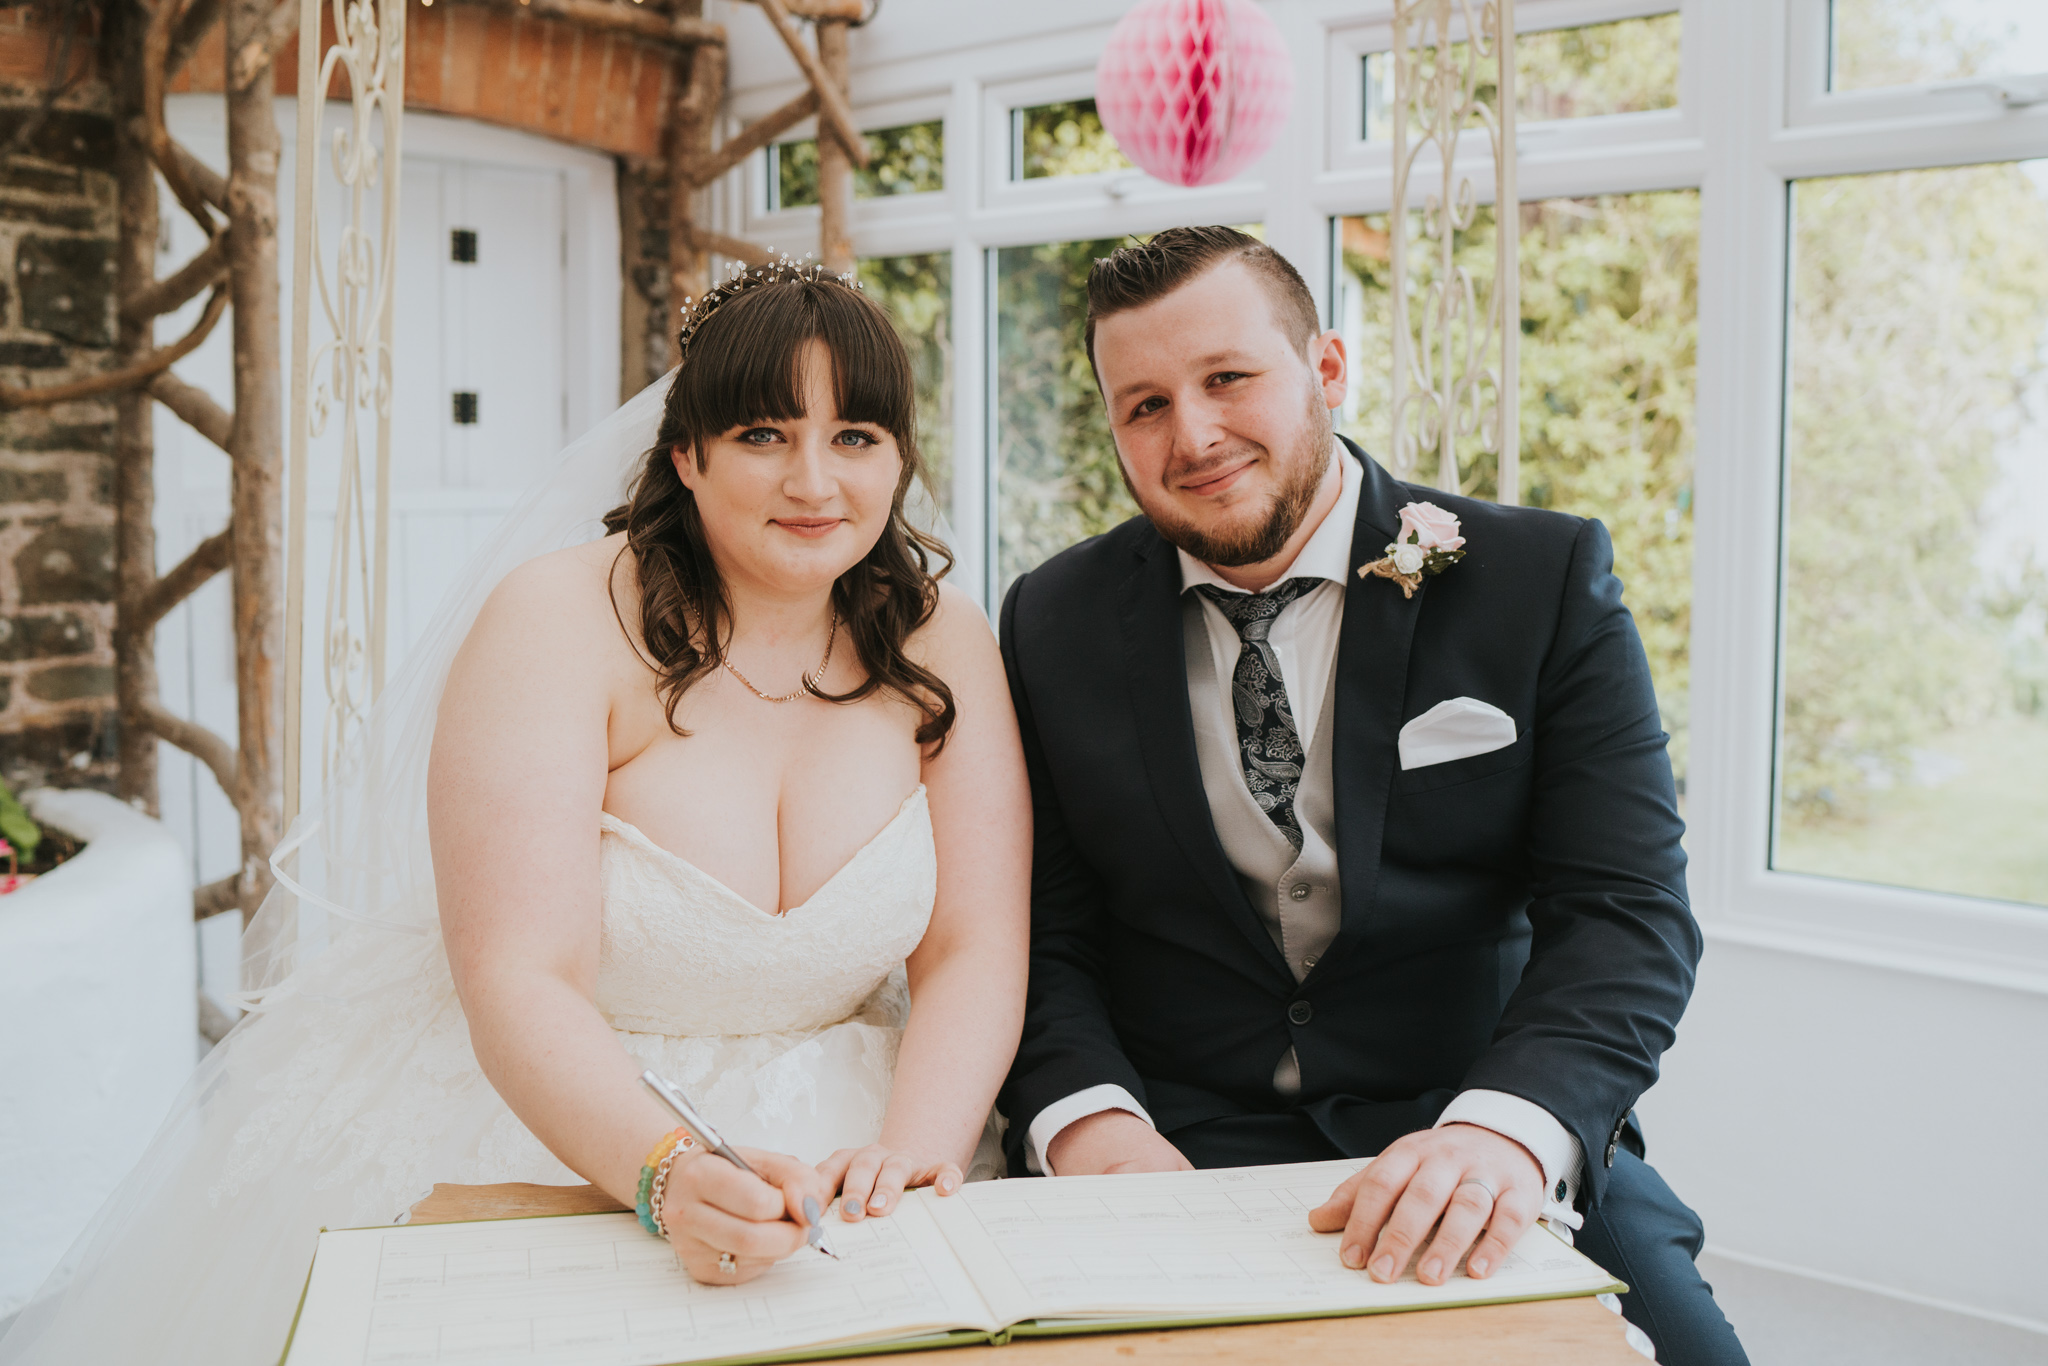 grace-sam-old-barn-clovelly-devon-wedding-photographer-grace-elizabeth-essex-suffolk-norfolk-wedding-photographer (62 of 132).jpg